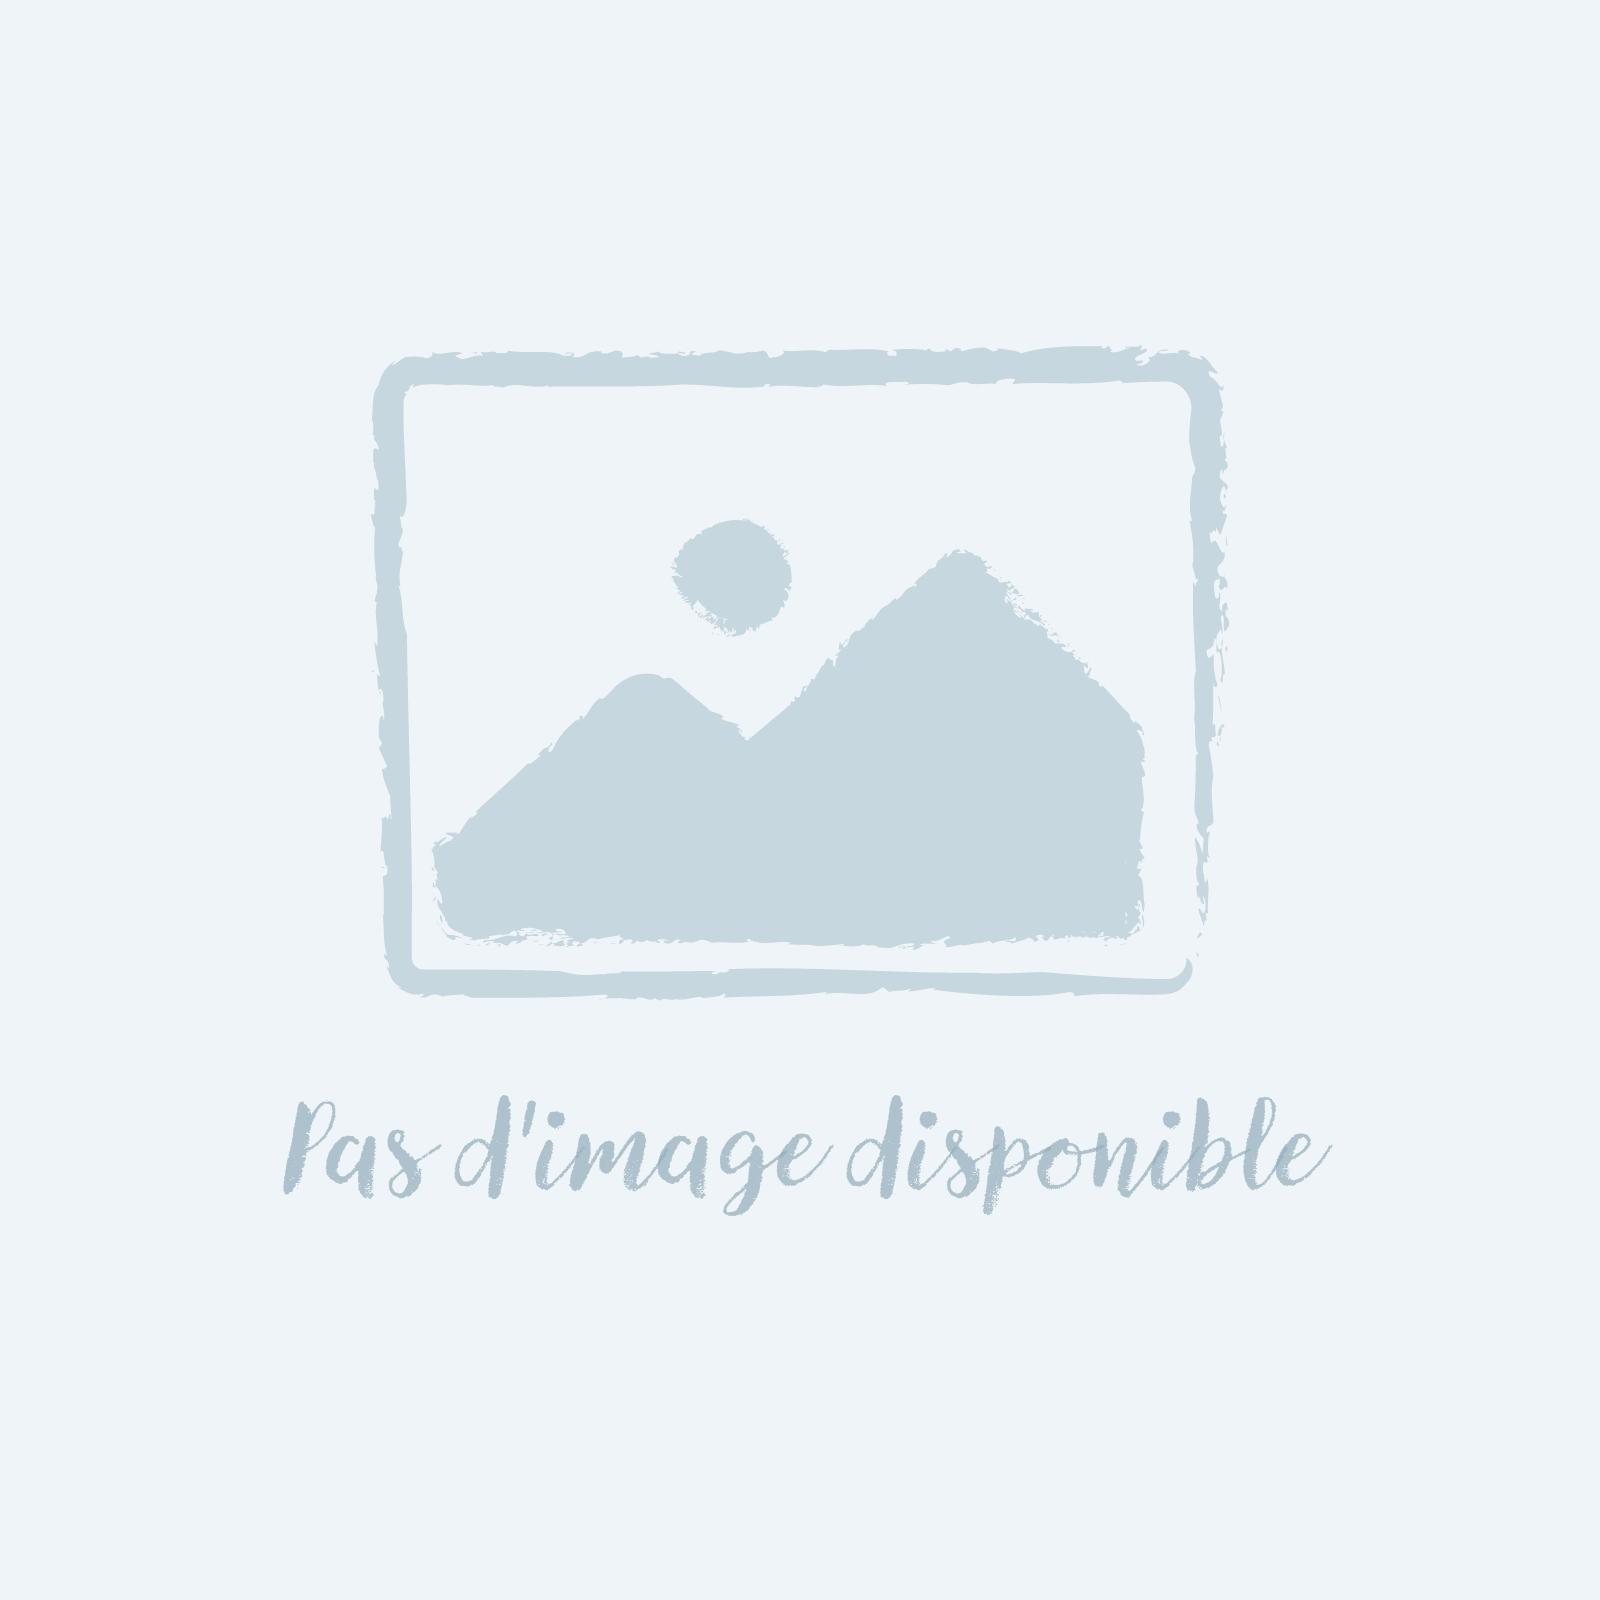 "Gerflor Virtuo Clic 55 ""0995 Sunny Black"" - Lame PVC clipsable"